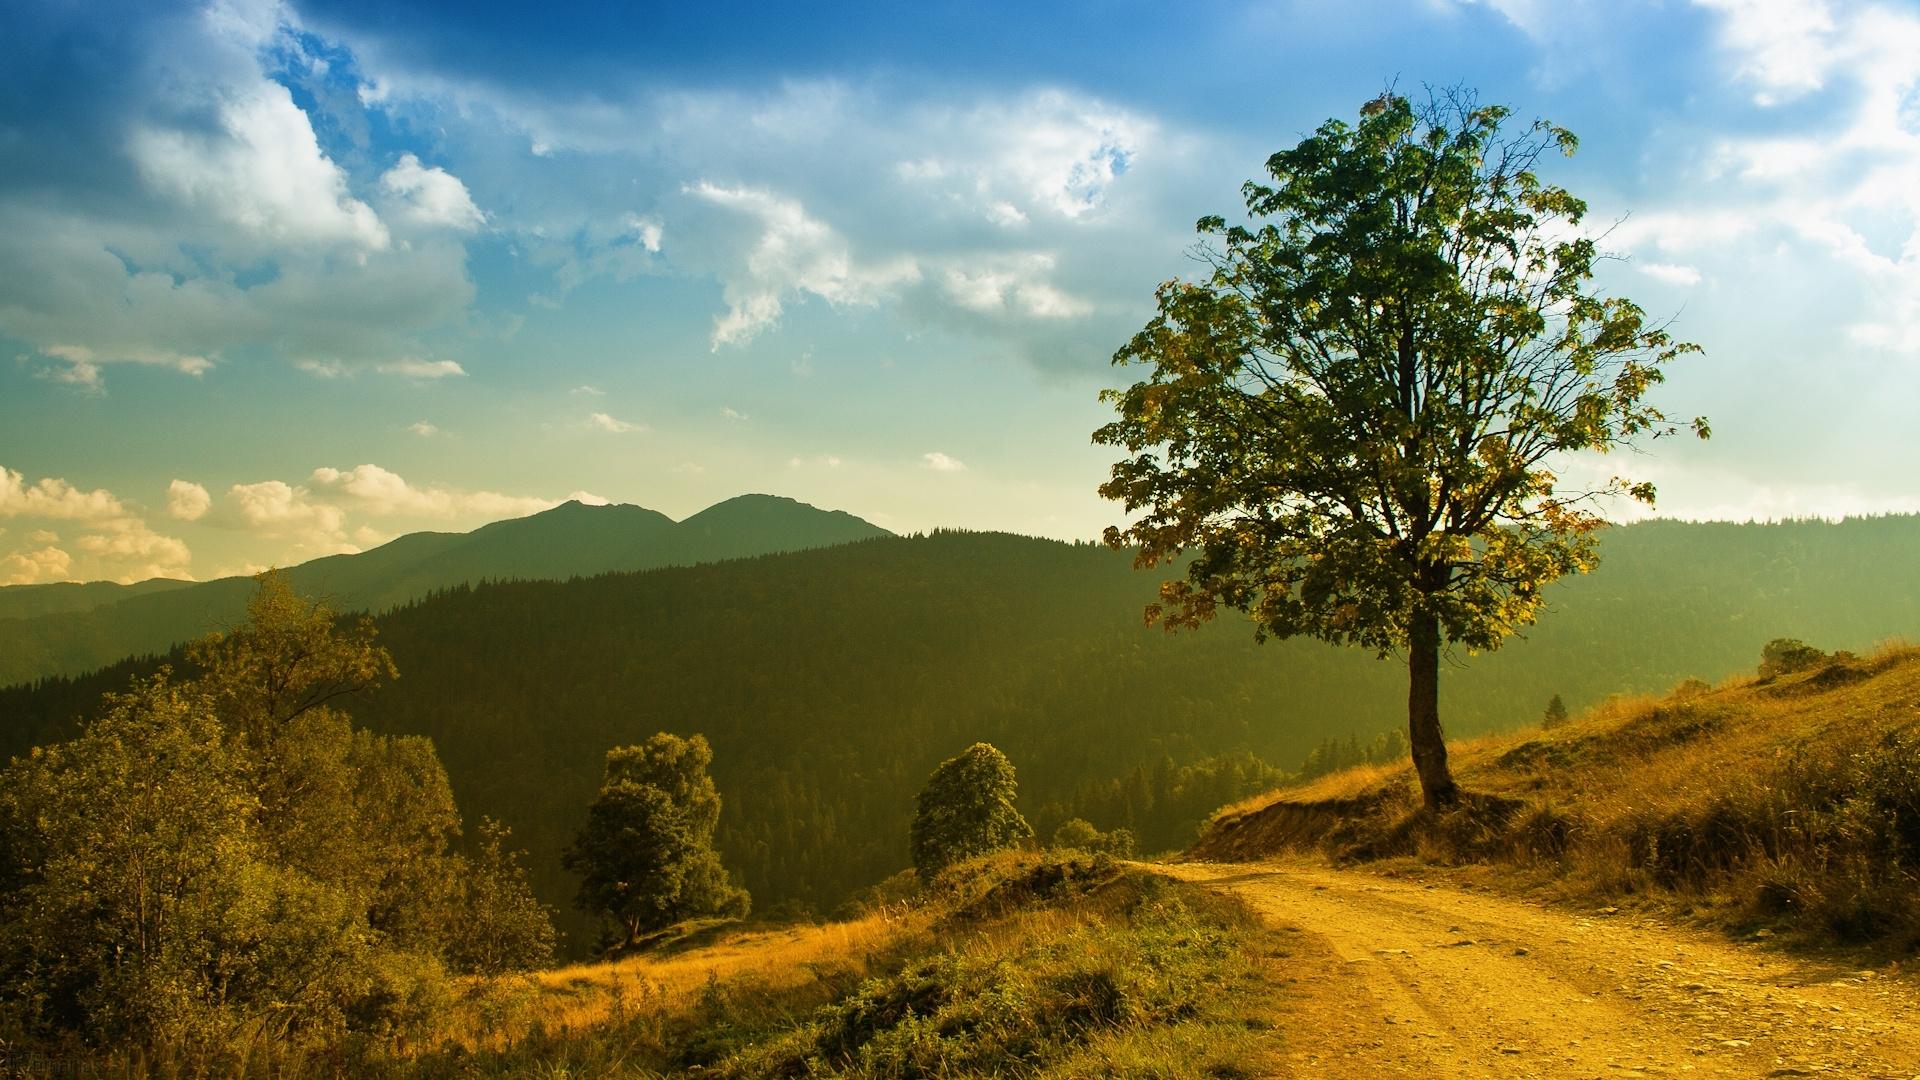 best hd nature wallpapers | wallpaper.wiki